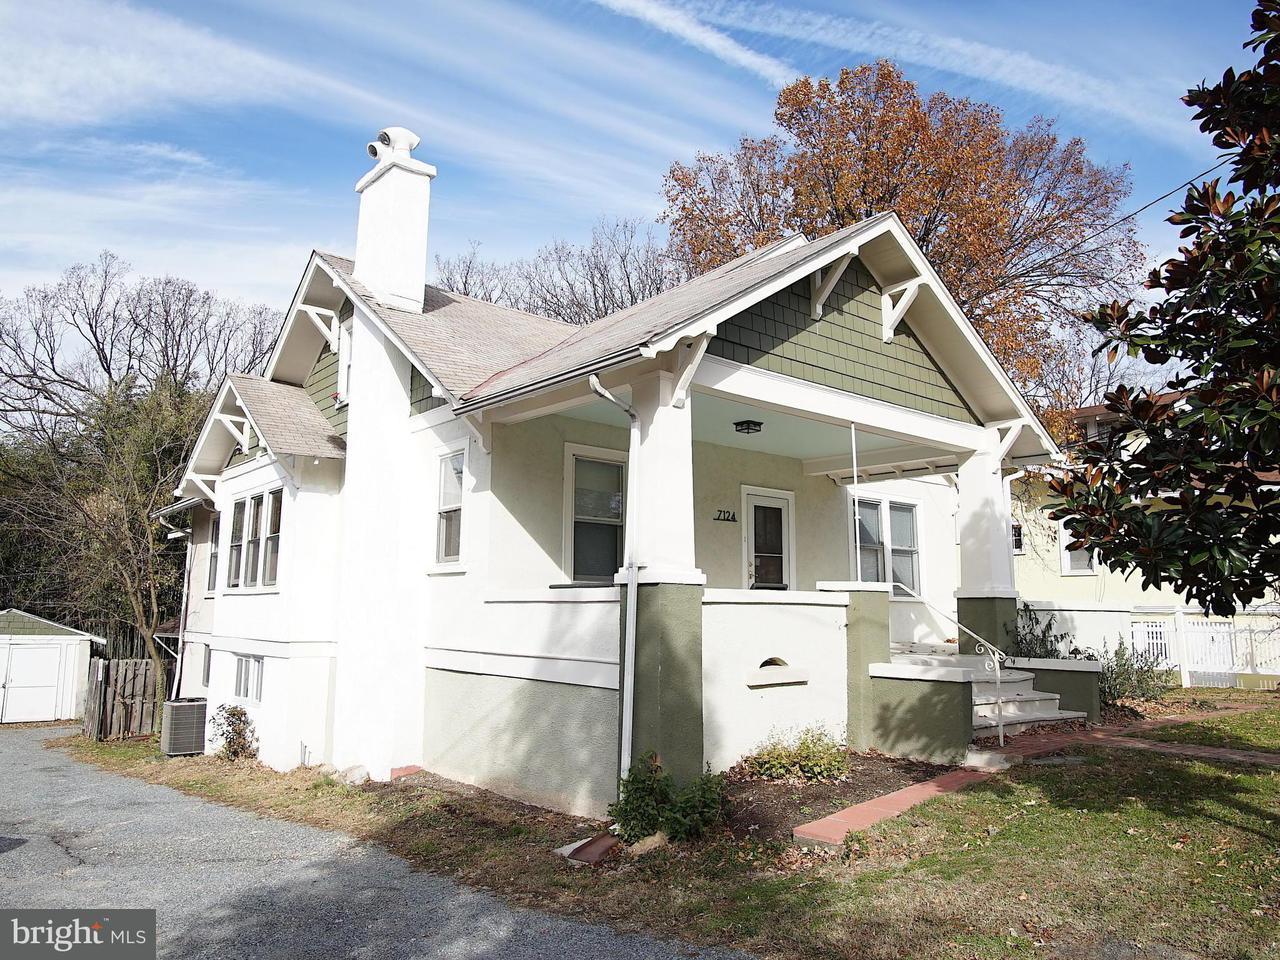 Multi-Family Home for Sale at 7124 Carroll Avenue 7124 Carroll Avenue Takoma Park, Maryland 20912 United States